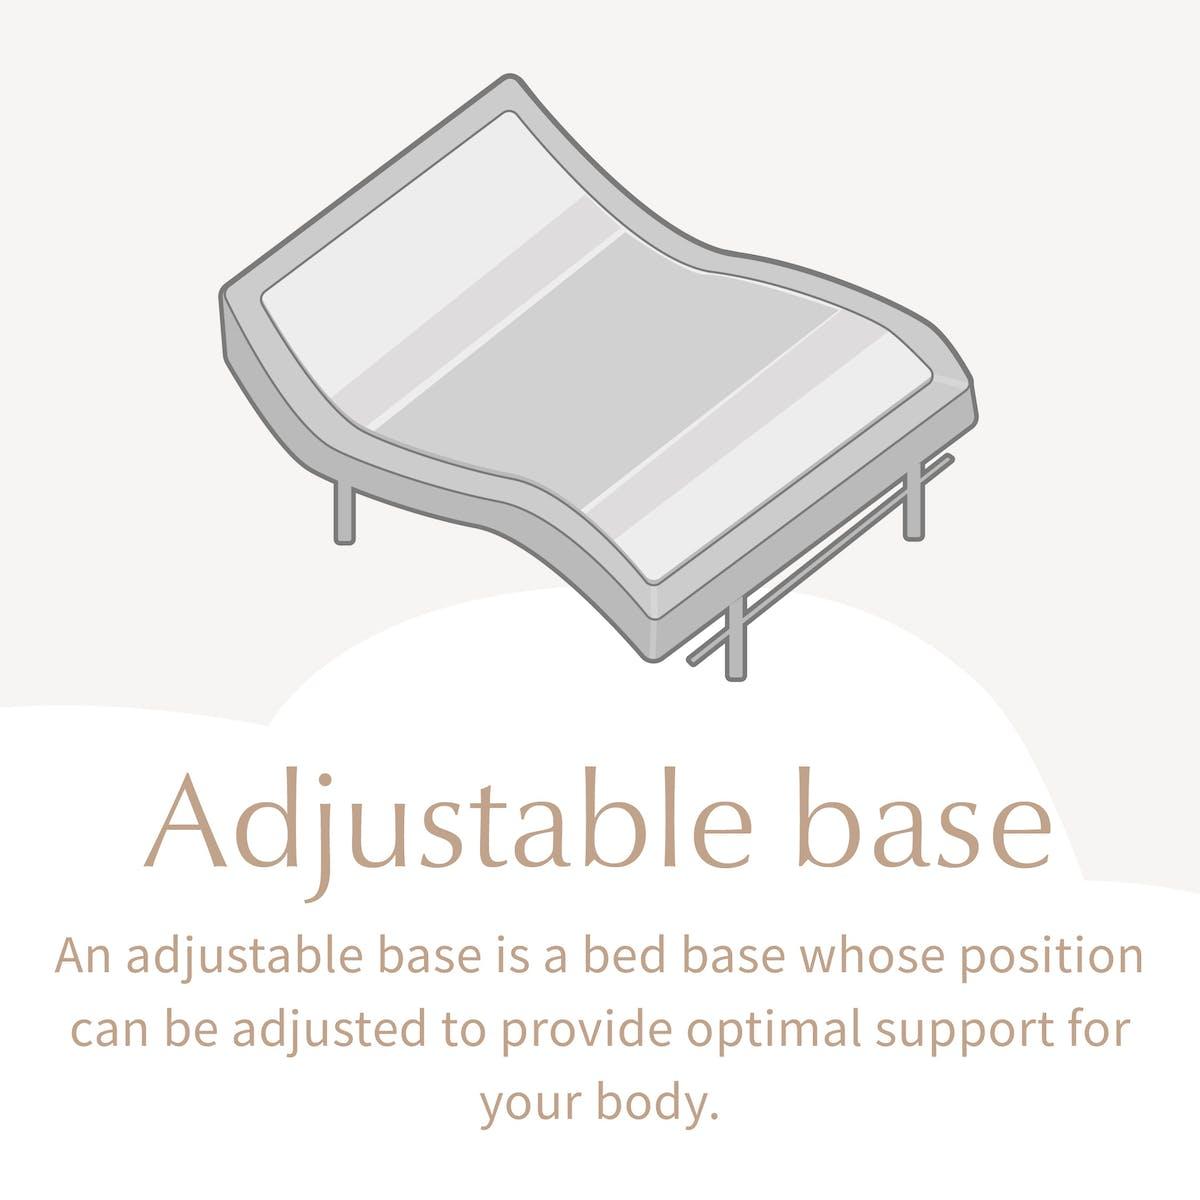 Illustration of an adjustable base with description underneath: